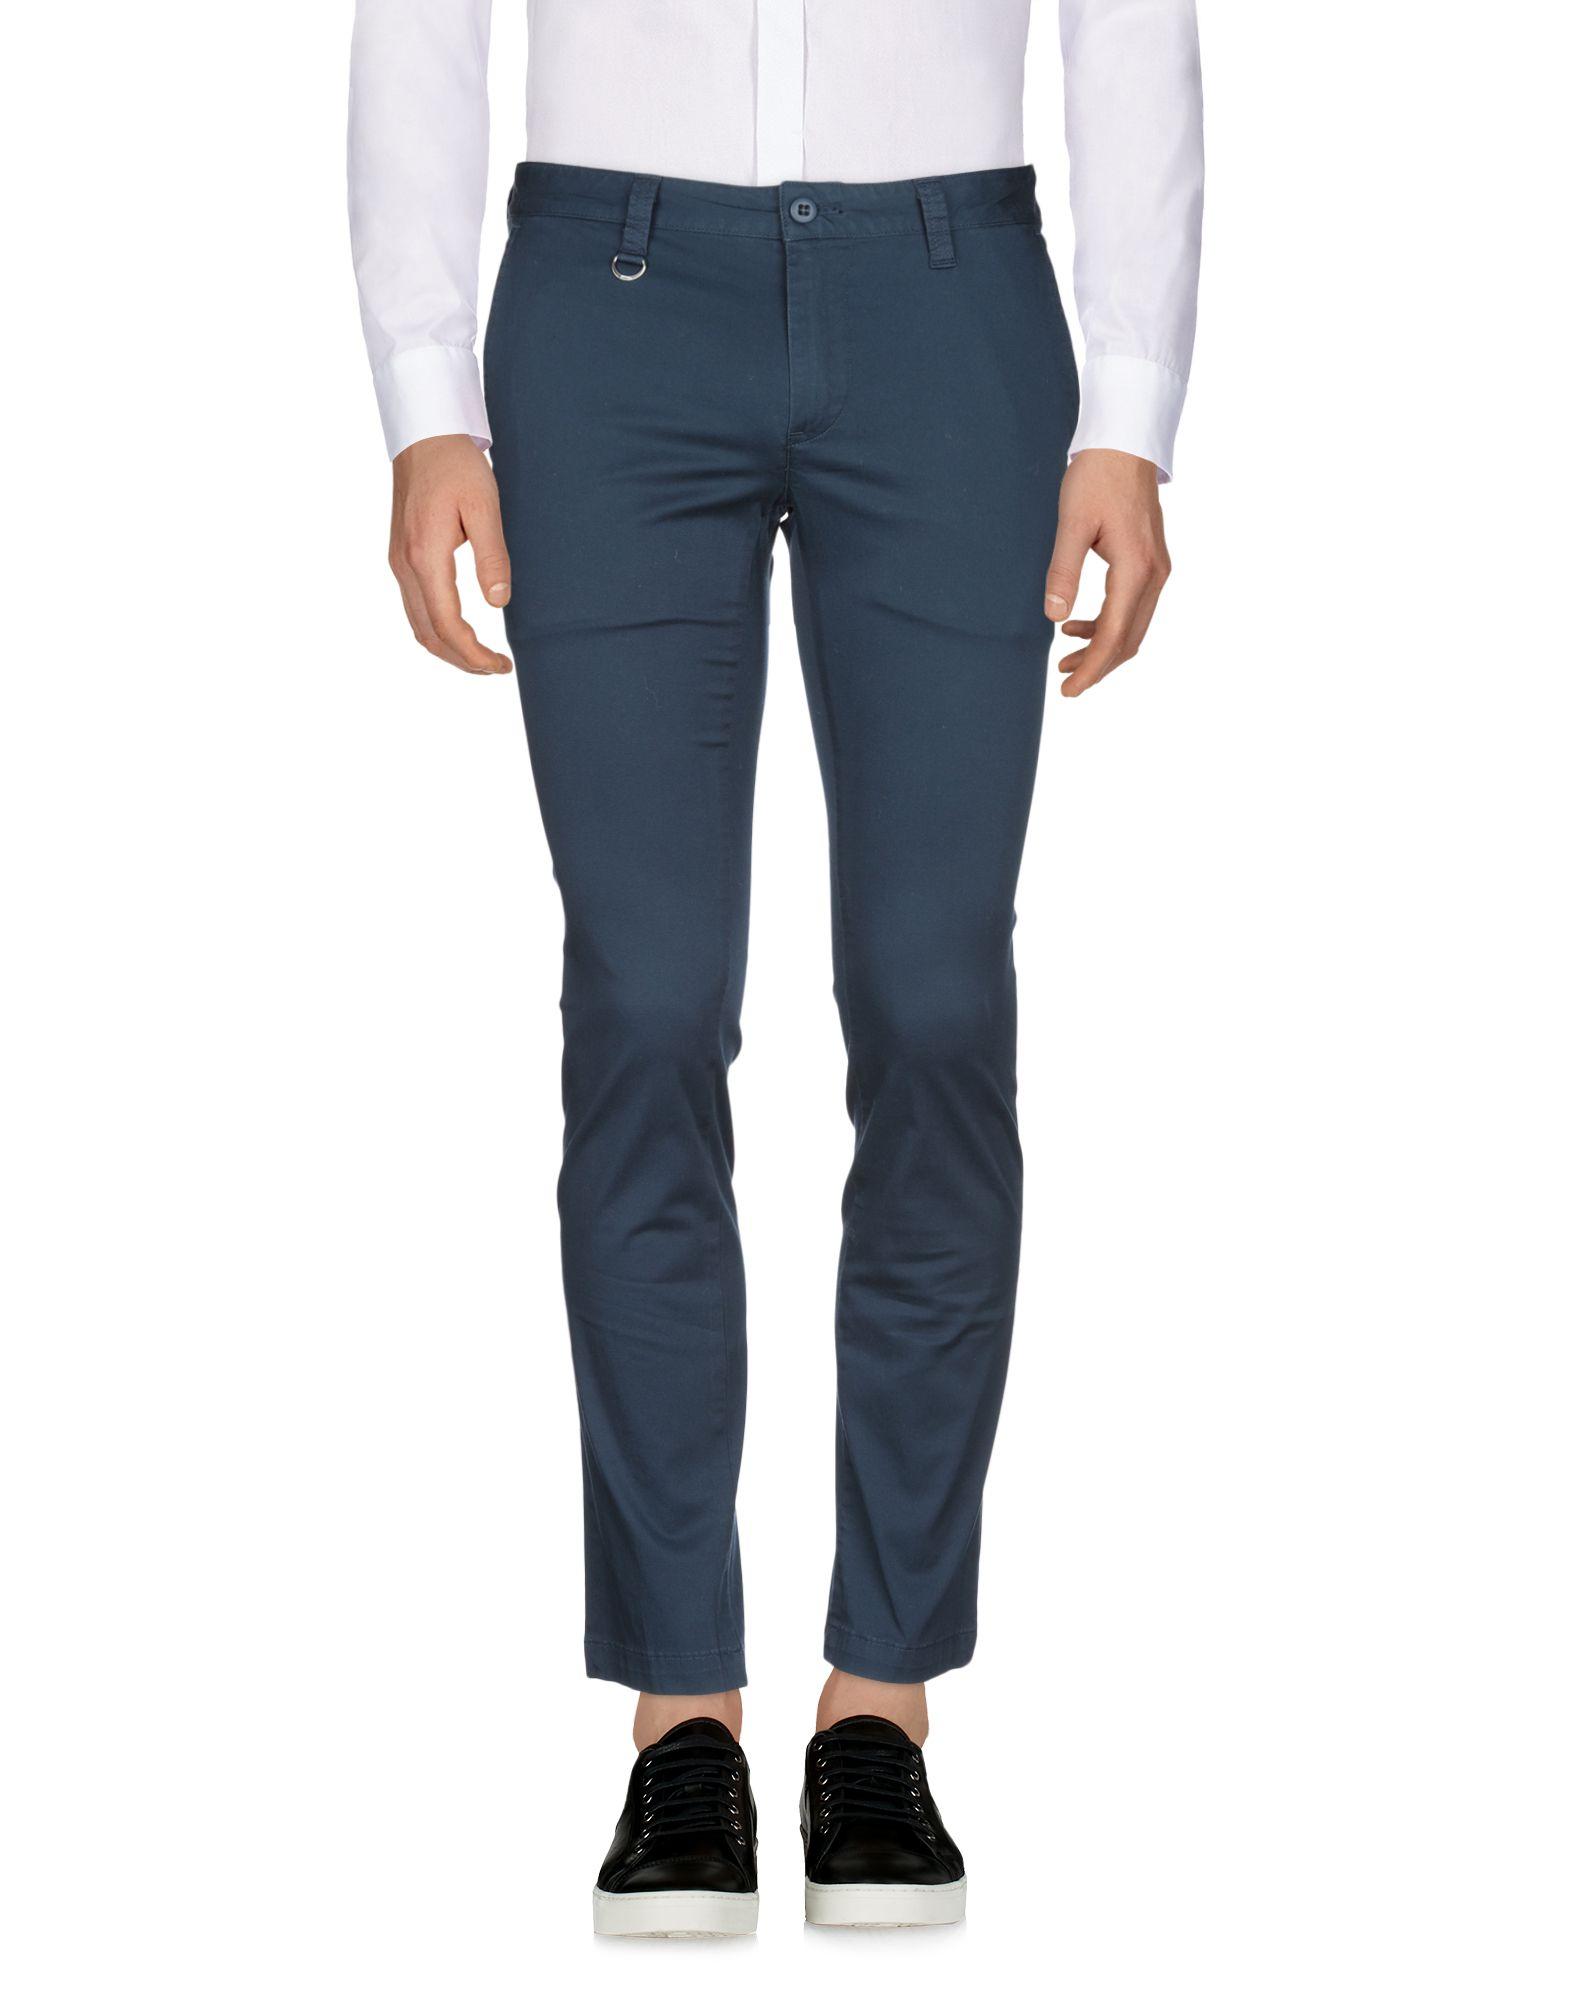 SOPHNET. Casual Pants in Dark Blue